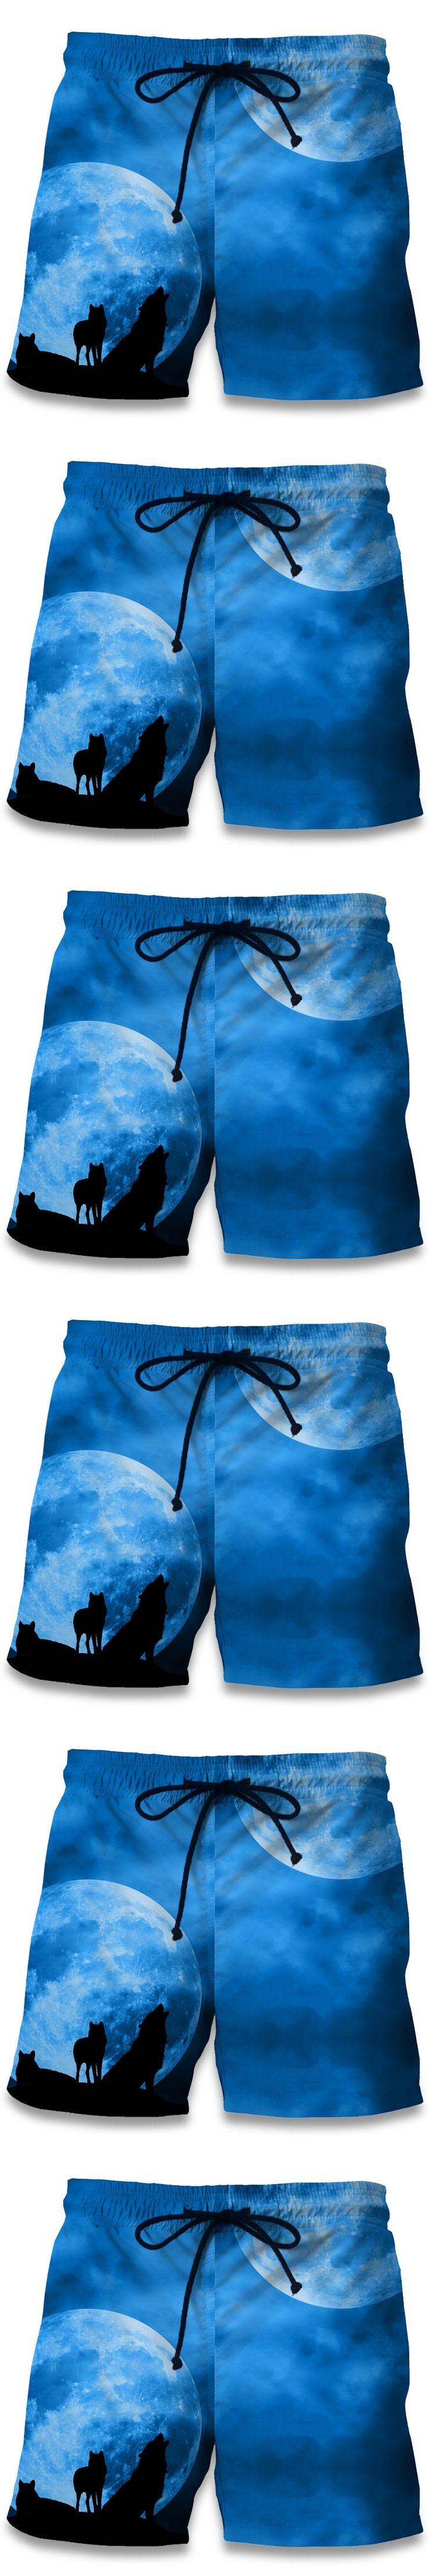 Summer Men Beach Shorts 2017 Moonlight Wolf 3D Print Fashion Men's Bermuda Boardshorts Fitness Trousers Plus Size 6XL Quick Dry